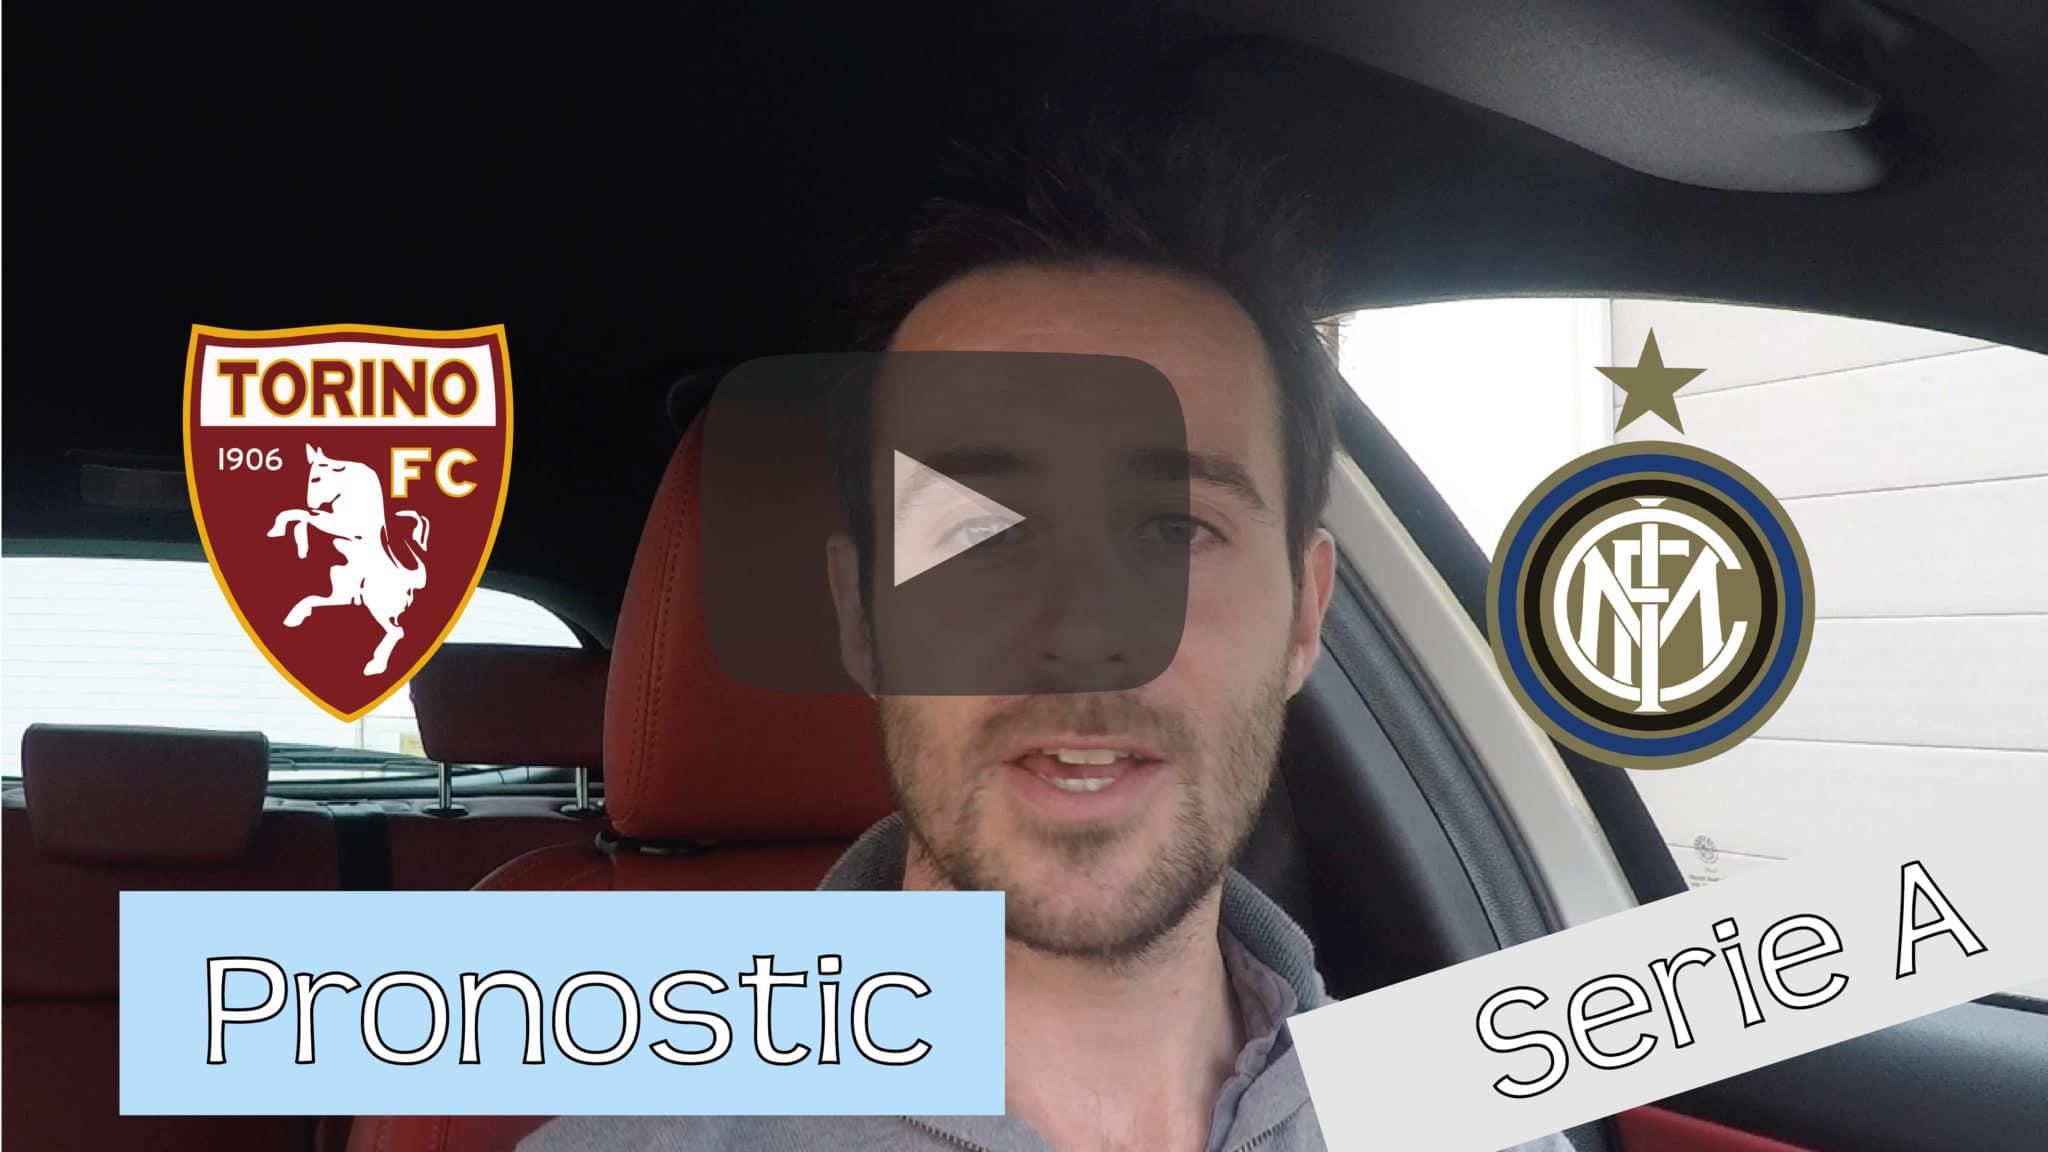 [VIP -> Public] Pronostic 133 – Torino / Inter Milan – Serie A